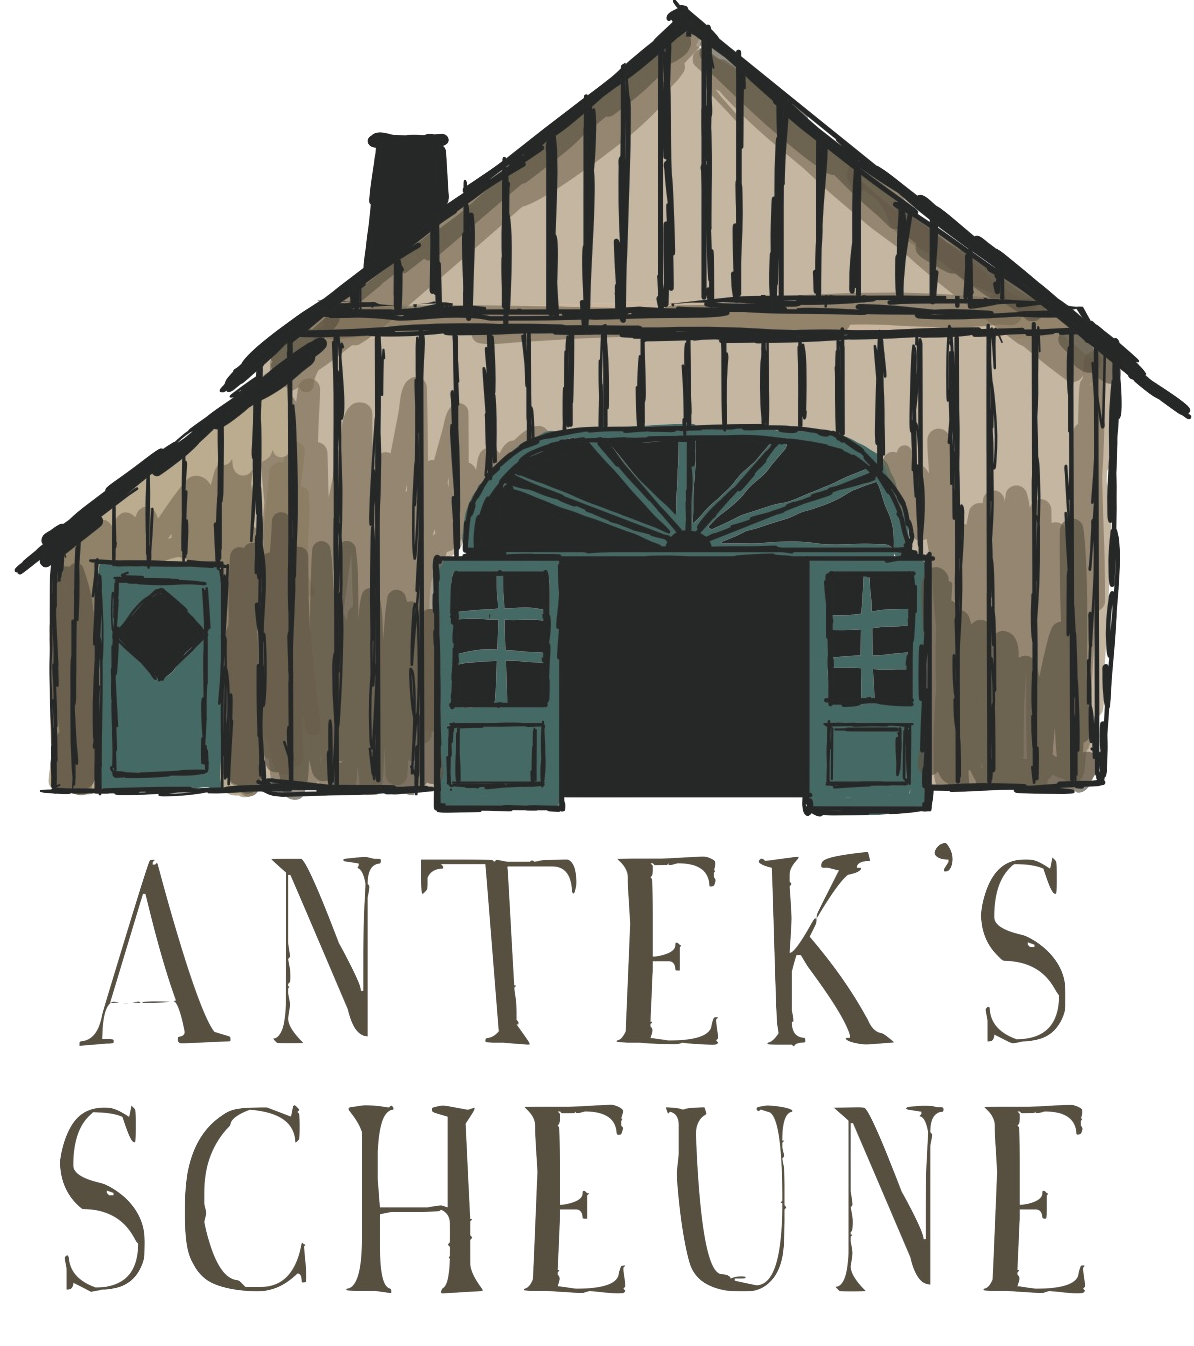 Antek's Scheune